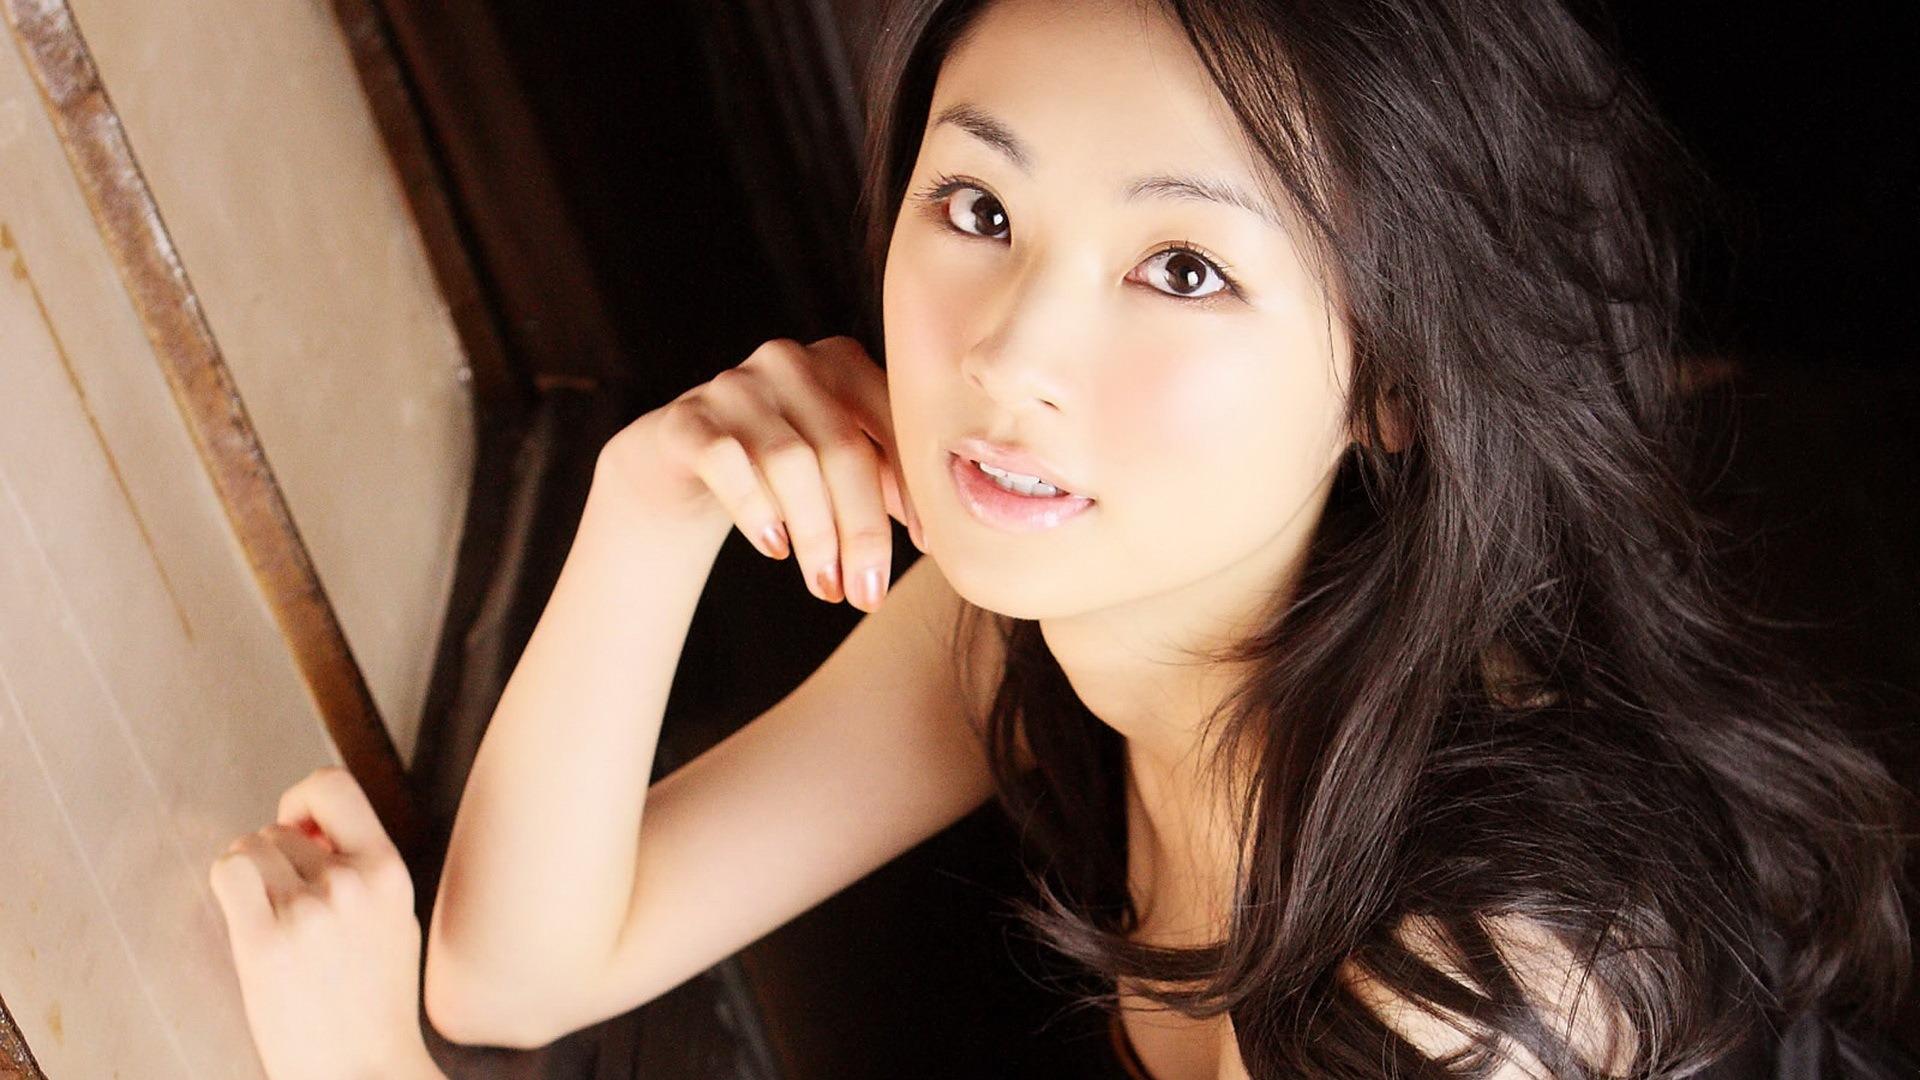 Tantan Hayashi Backgrounds, Compatible - PC, Mobile, Gadgets| 1920x1080 px